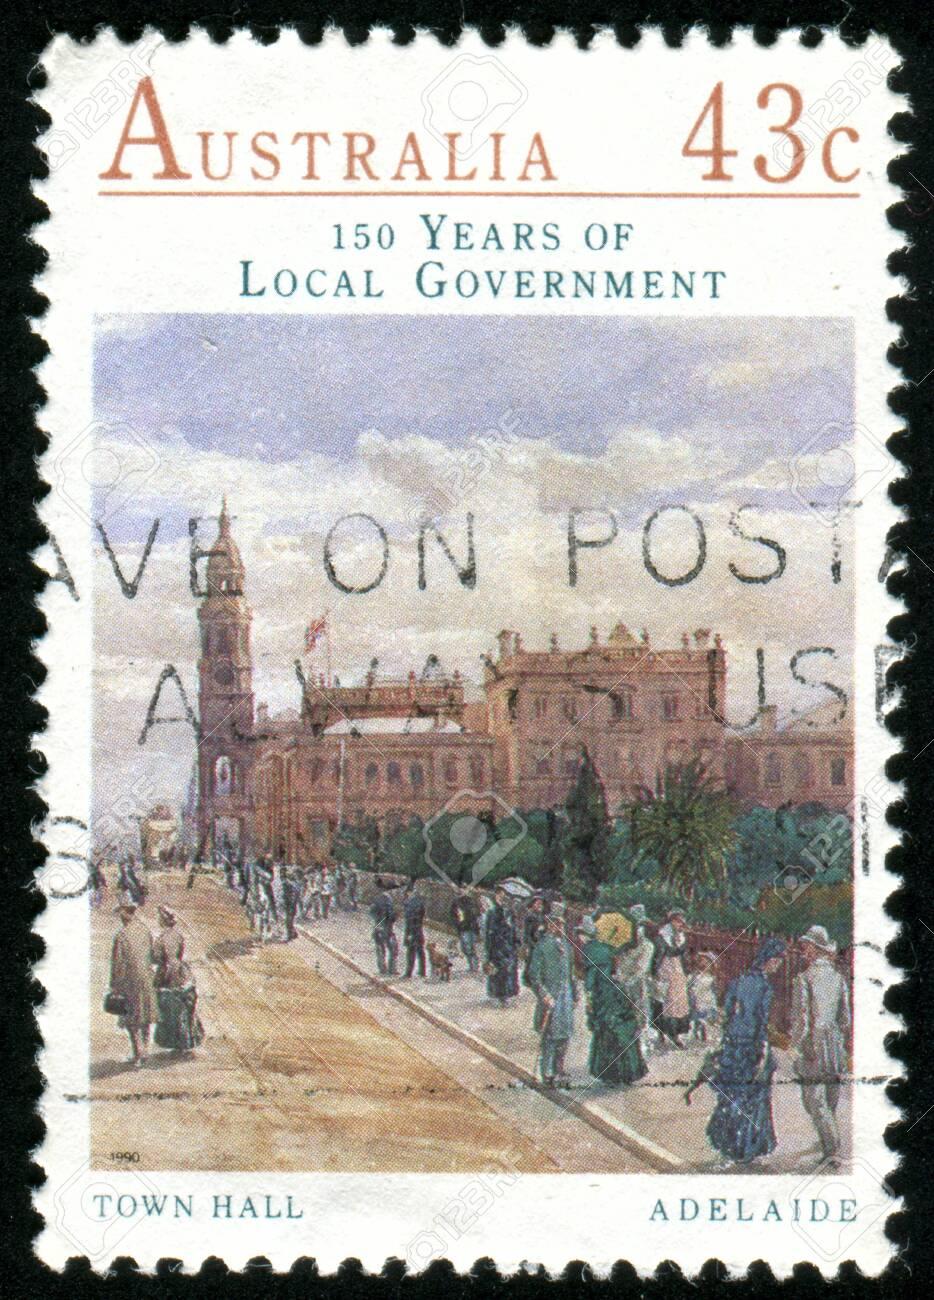 AUSTRALIA - CIRCA 1990: stamp printed by Australia, shows Town Hall, Adelaide, circa 1990 Stock Photo - 8560140